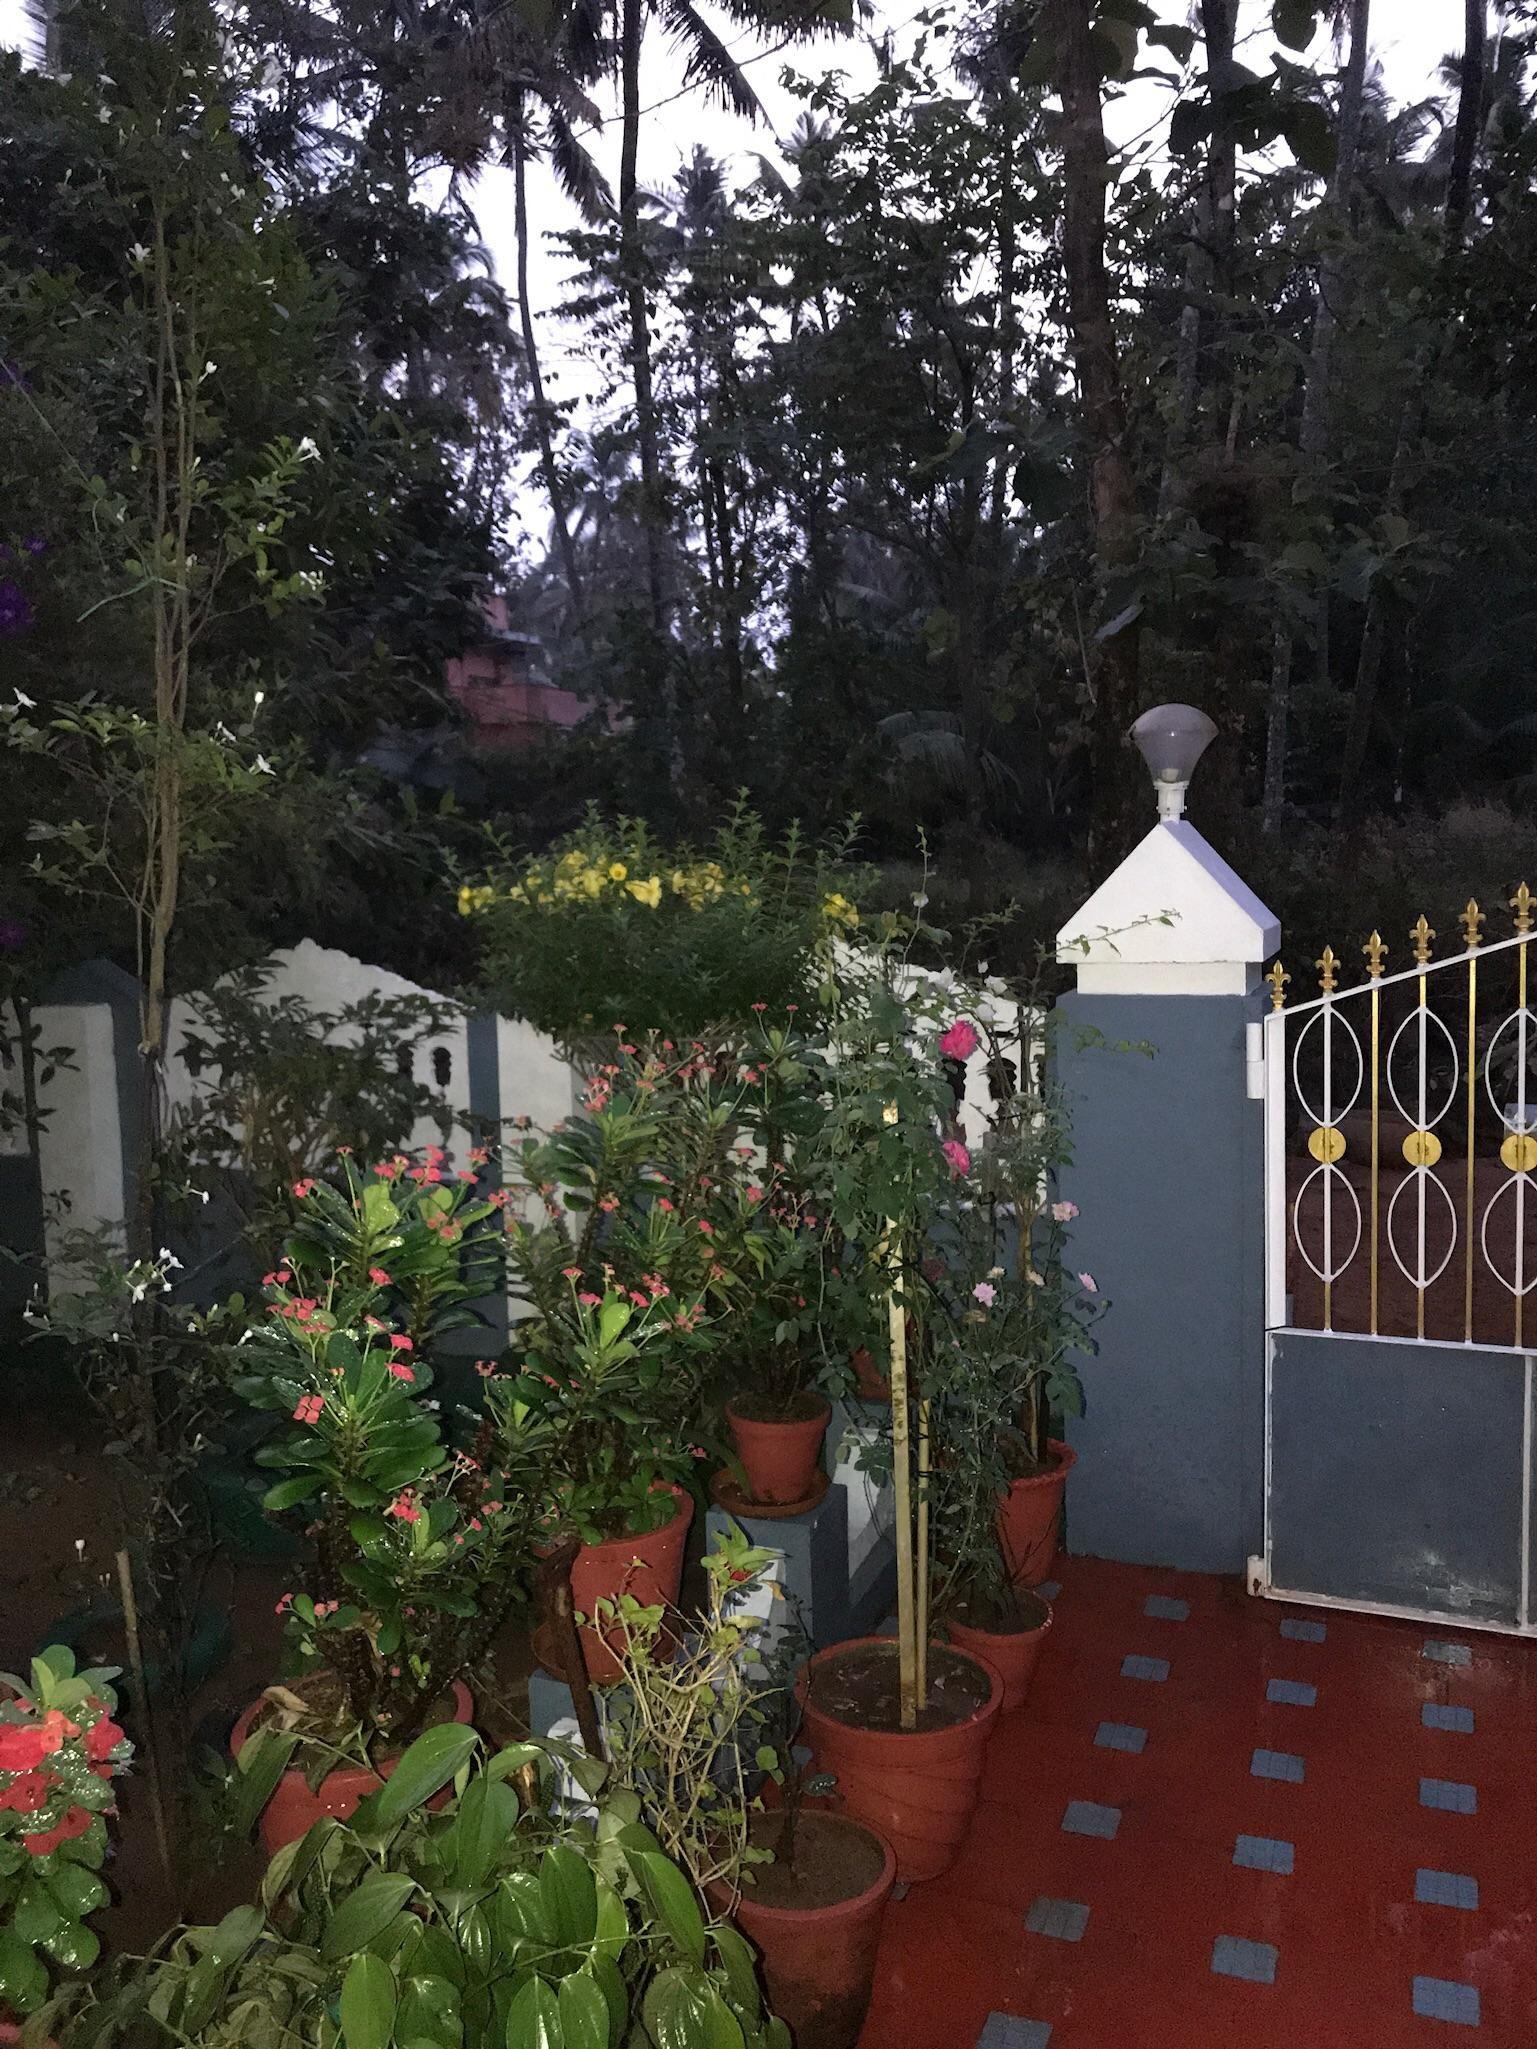 My Friends Garden House In India Gardening Garden Diy Home Flowers Roses Nature Landscaping Small Garden Landscape Hampton Garden Garden Landscaping